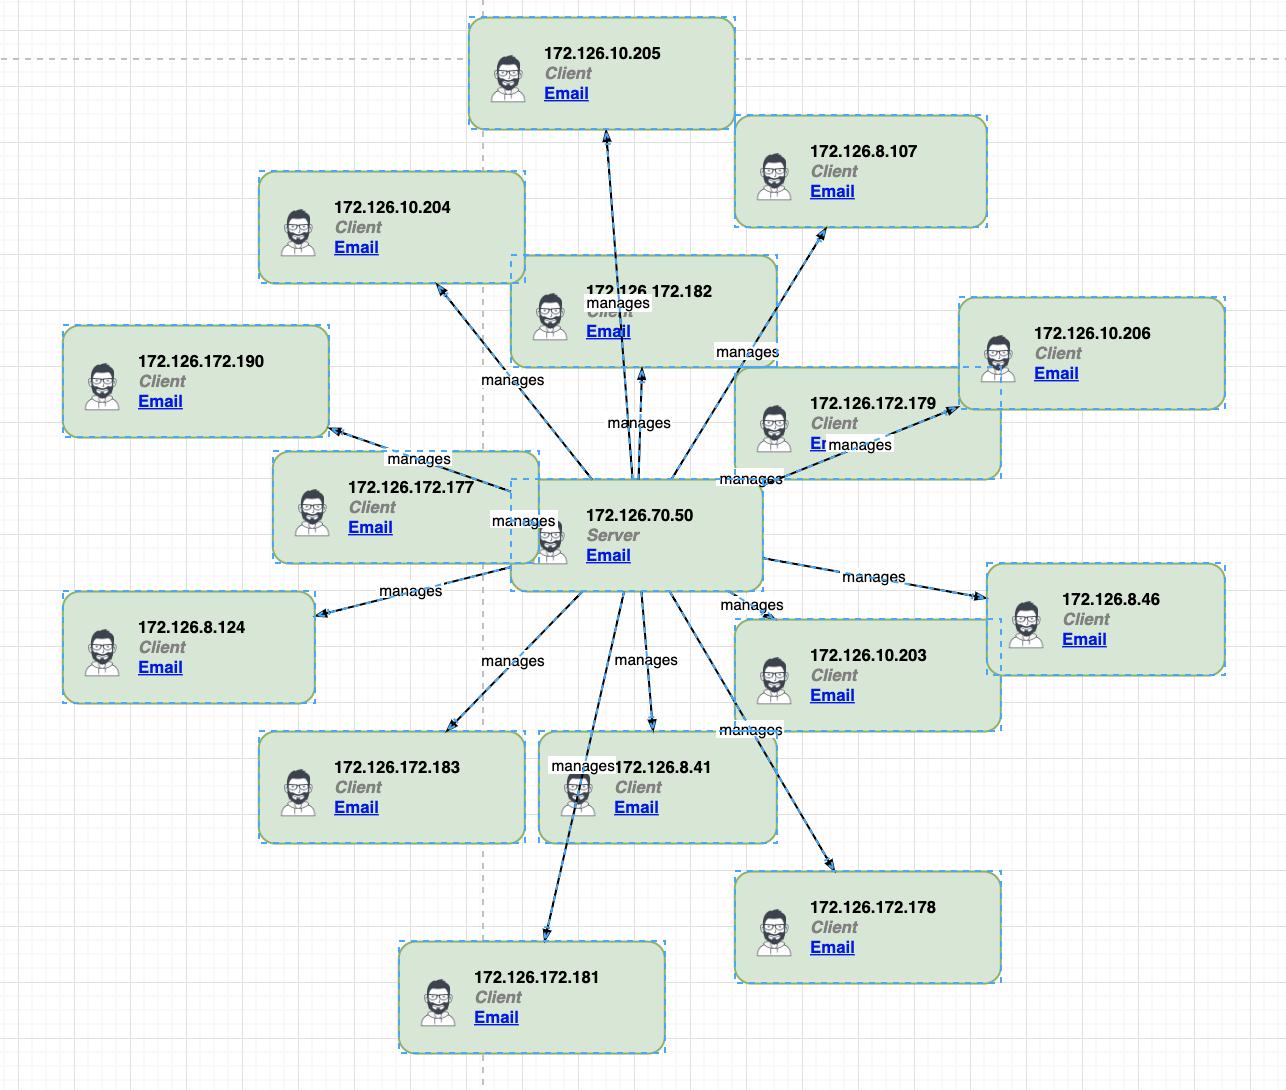 Data Flow Diagram I Can Export A Network Data Flow Diagram Via Csv But Cant Import